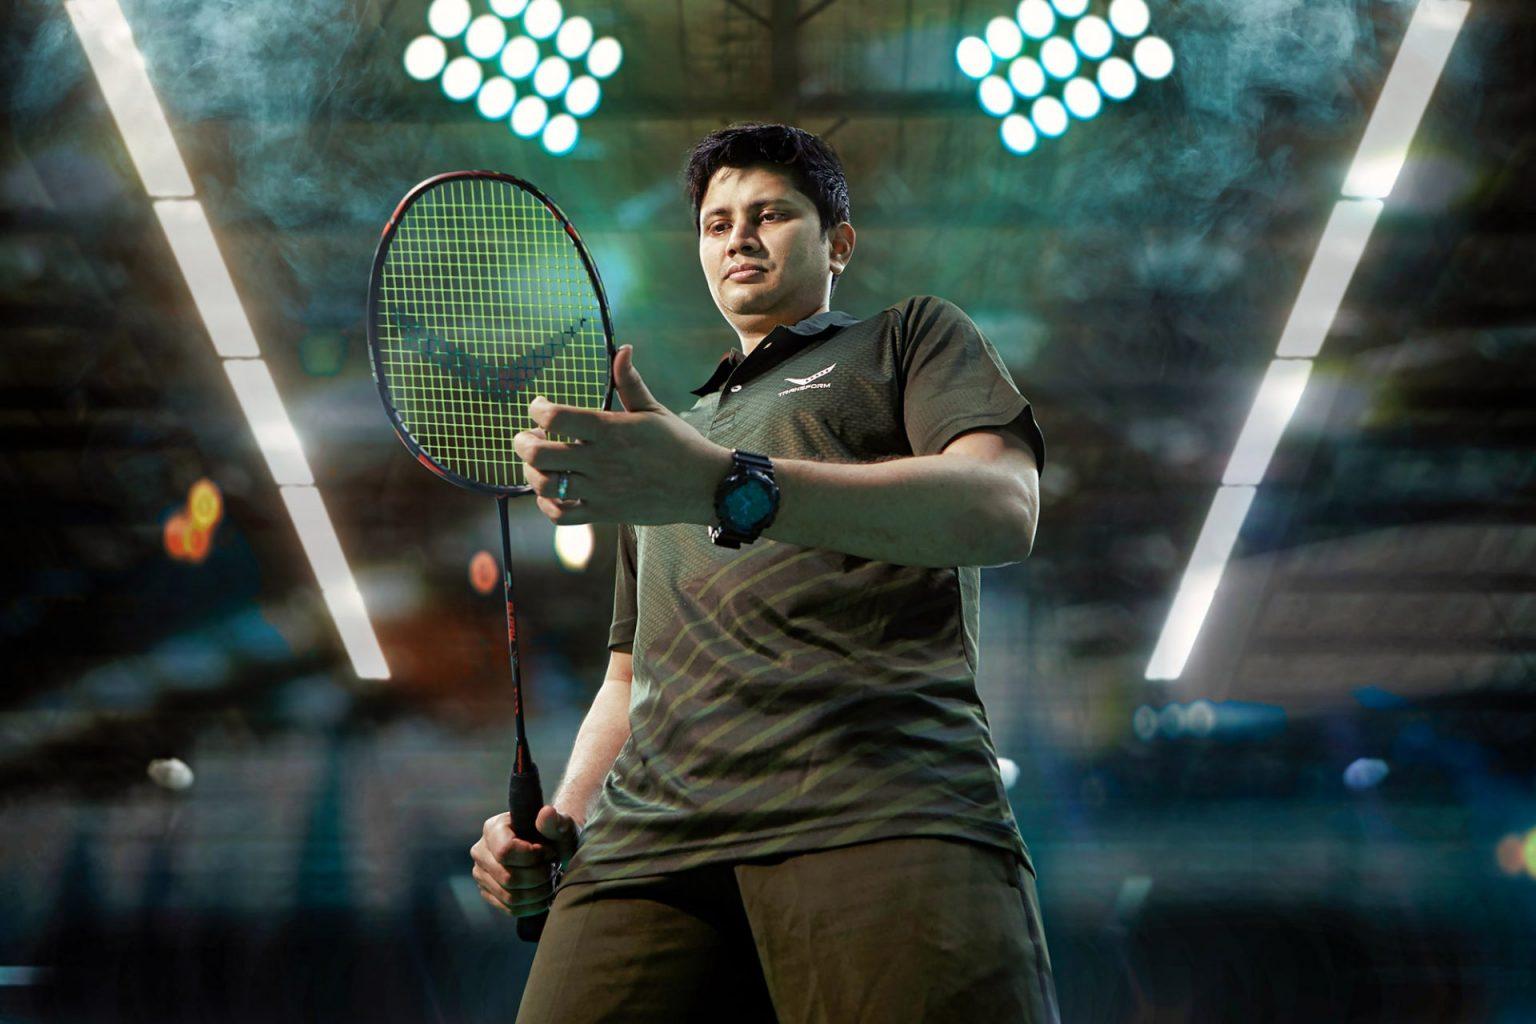 Commonwealth Games medallist shuttler Chetan Anand with Transform racquet